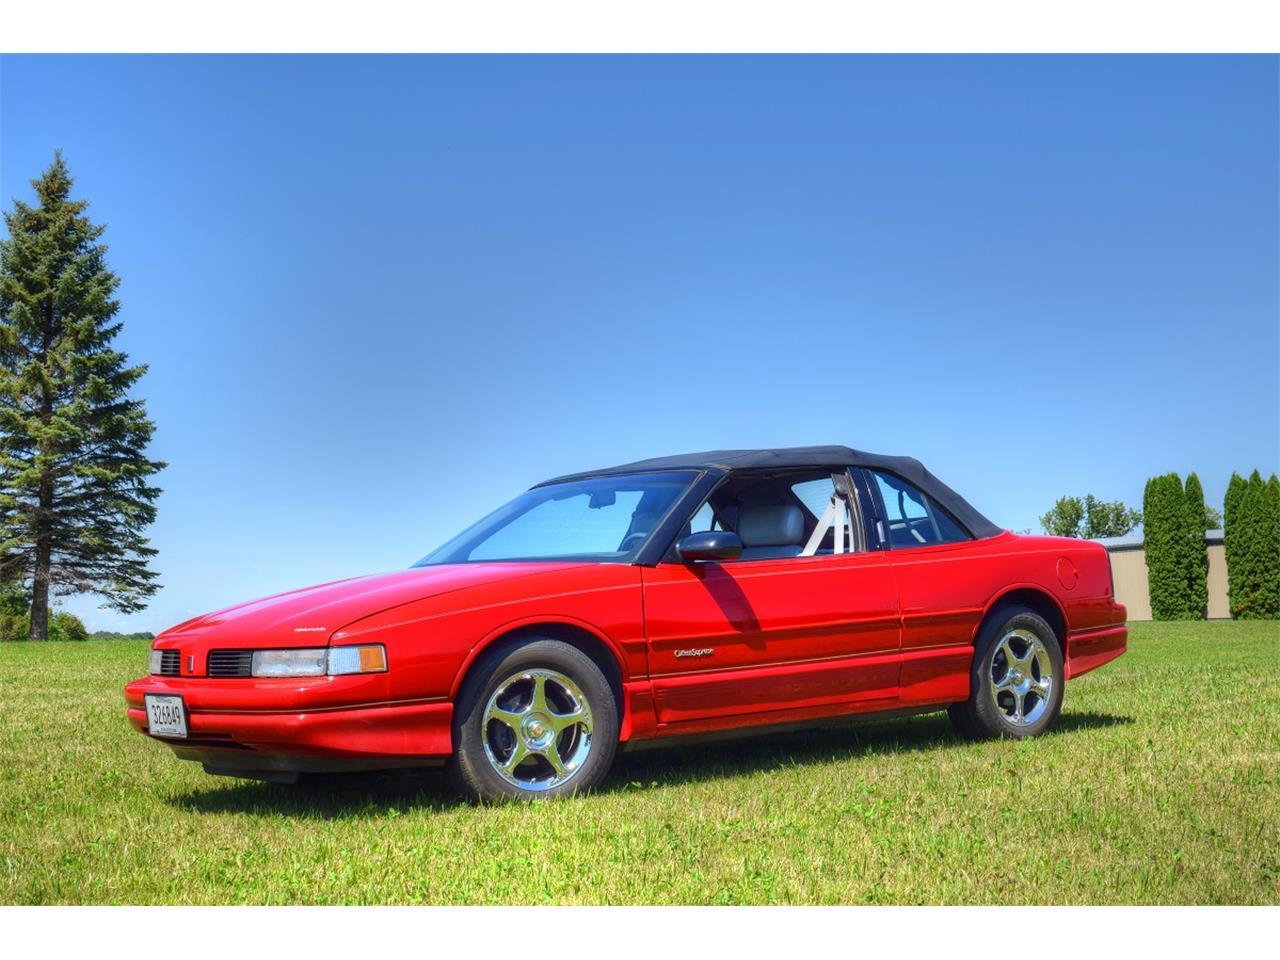 1991 Oldsmobile Cutlass (CC-1378077) for sale in Watertown, Minnesota